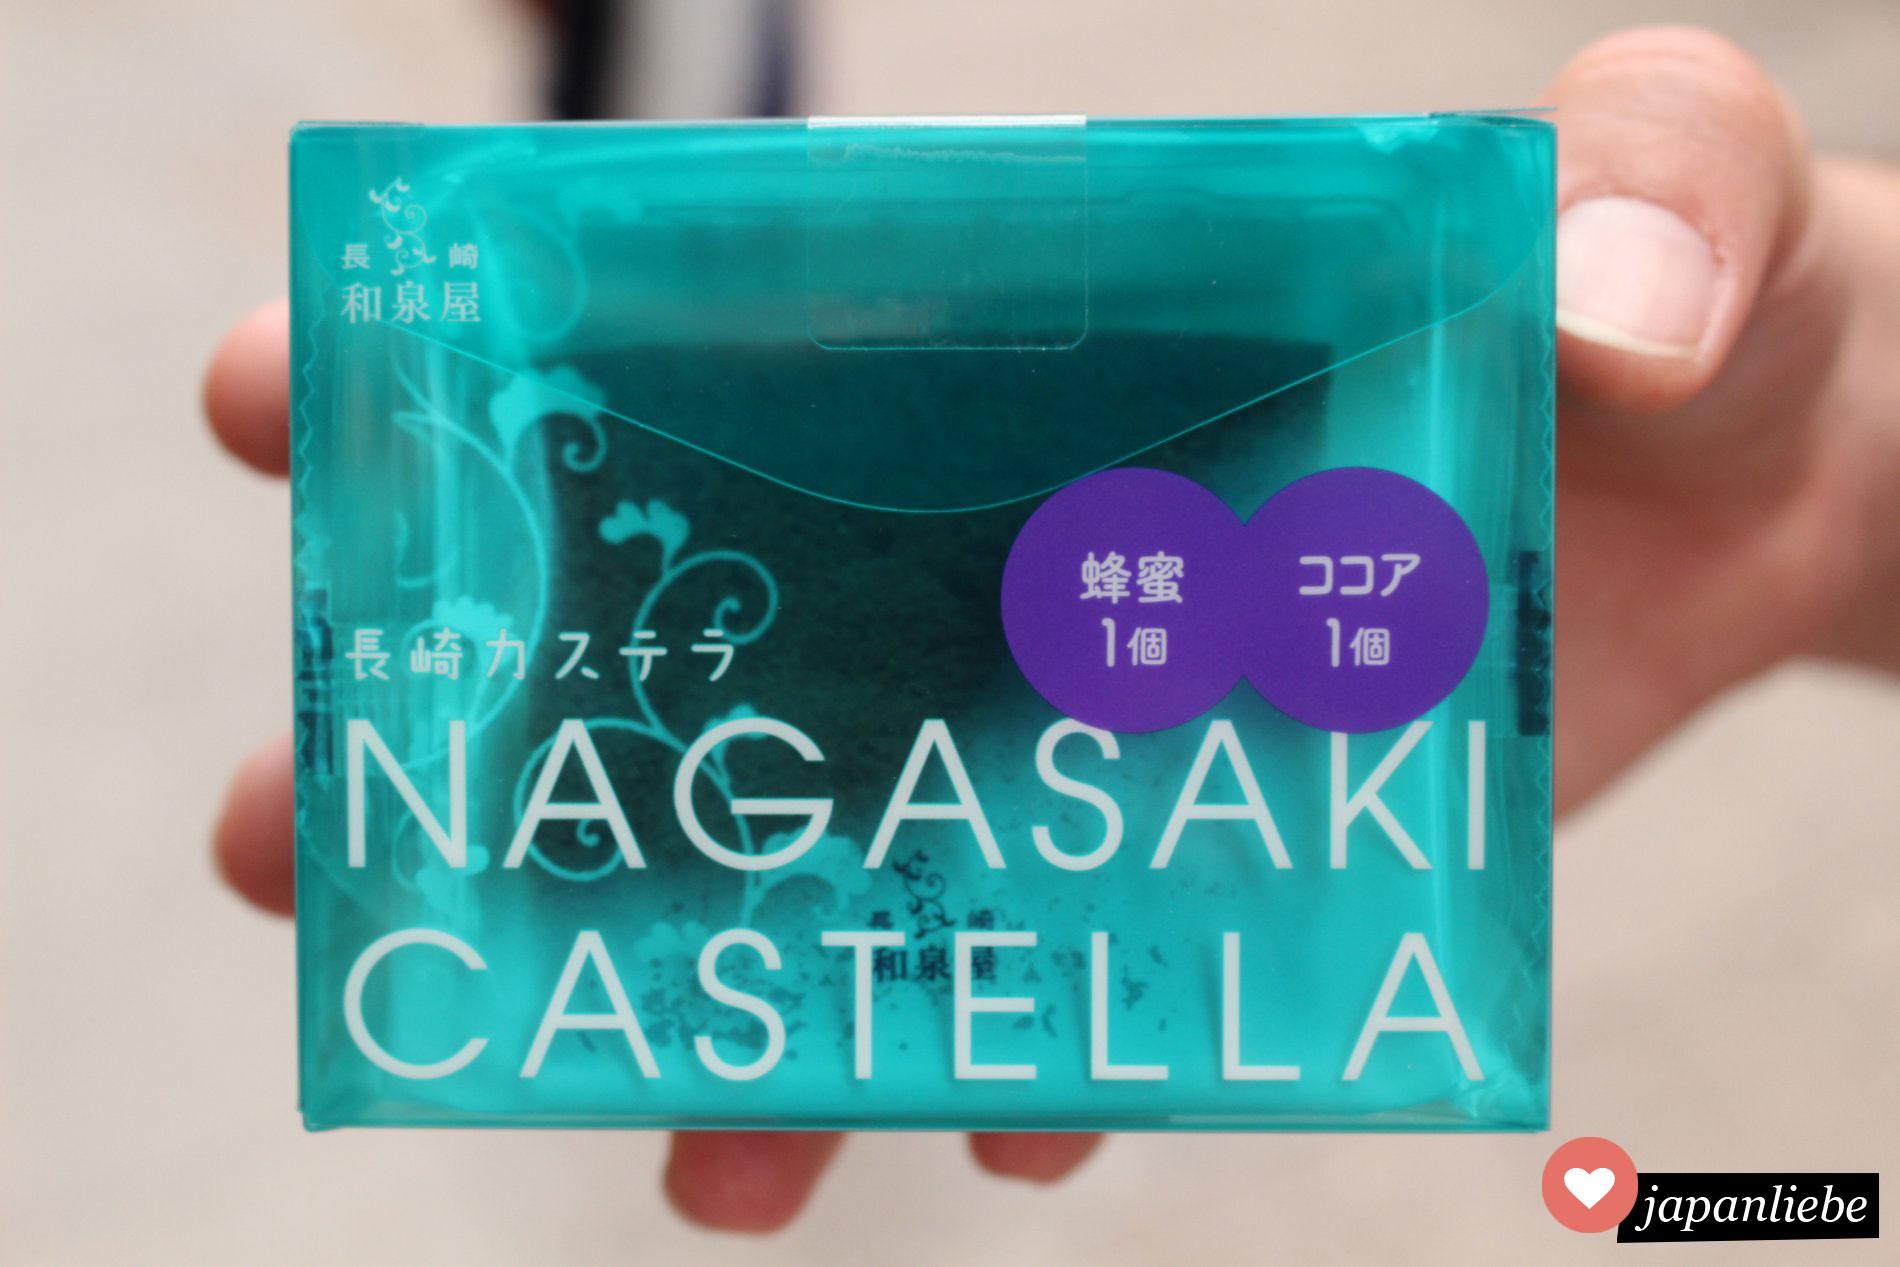 Nagasakis süße Spezialität: Castella Kuchen.